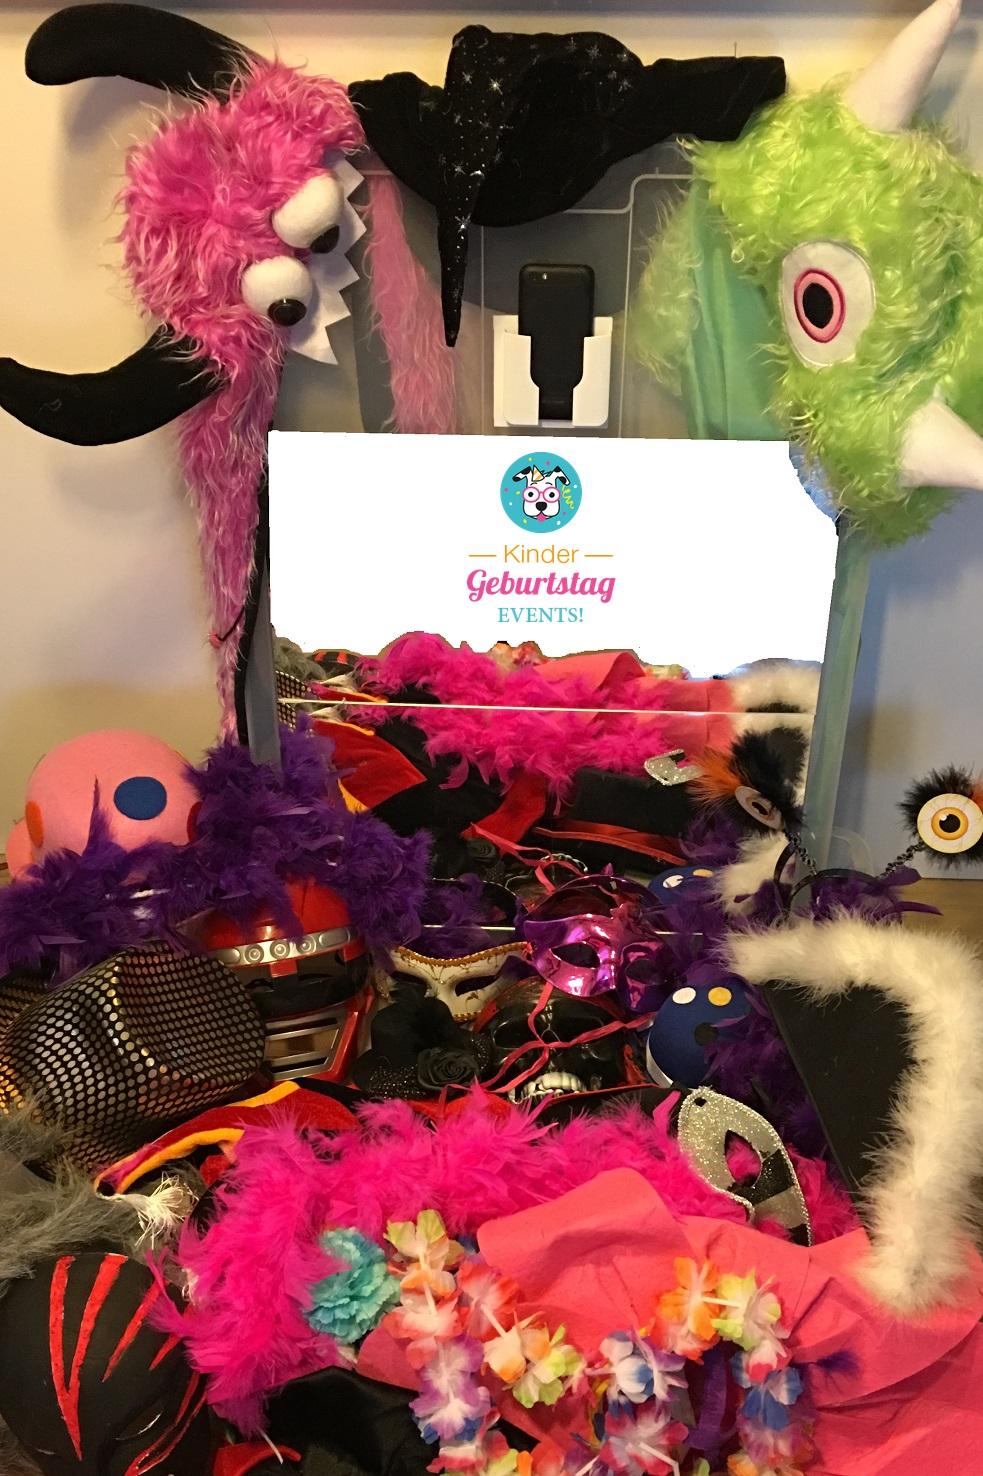 photobooth fotobox verkleidungsparty in frankfurt und umgebung kindergeburtstag events. Black Bedroom Furniture Sets. Home Design Ideas